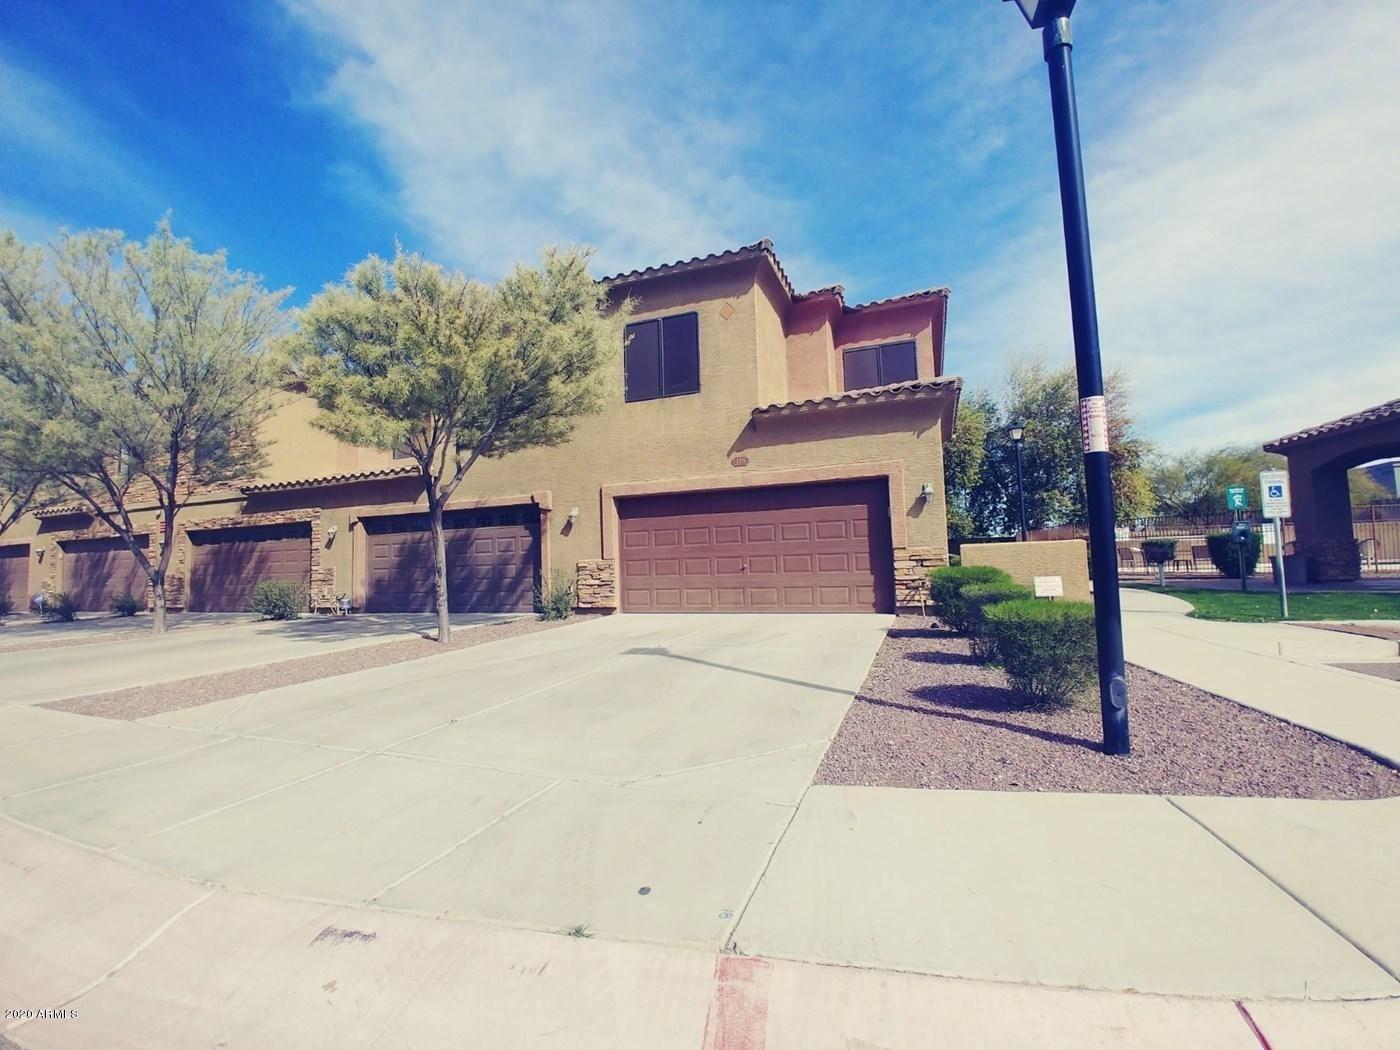 21655 N 36TH Avenue #118, Glendale, AZ 85308 - MLS#: 6043491